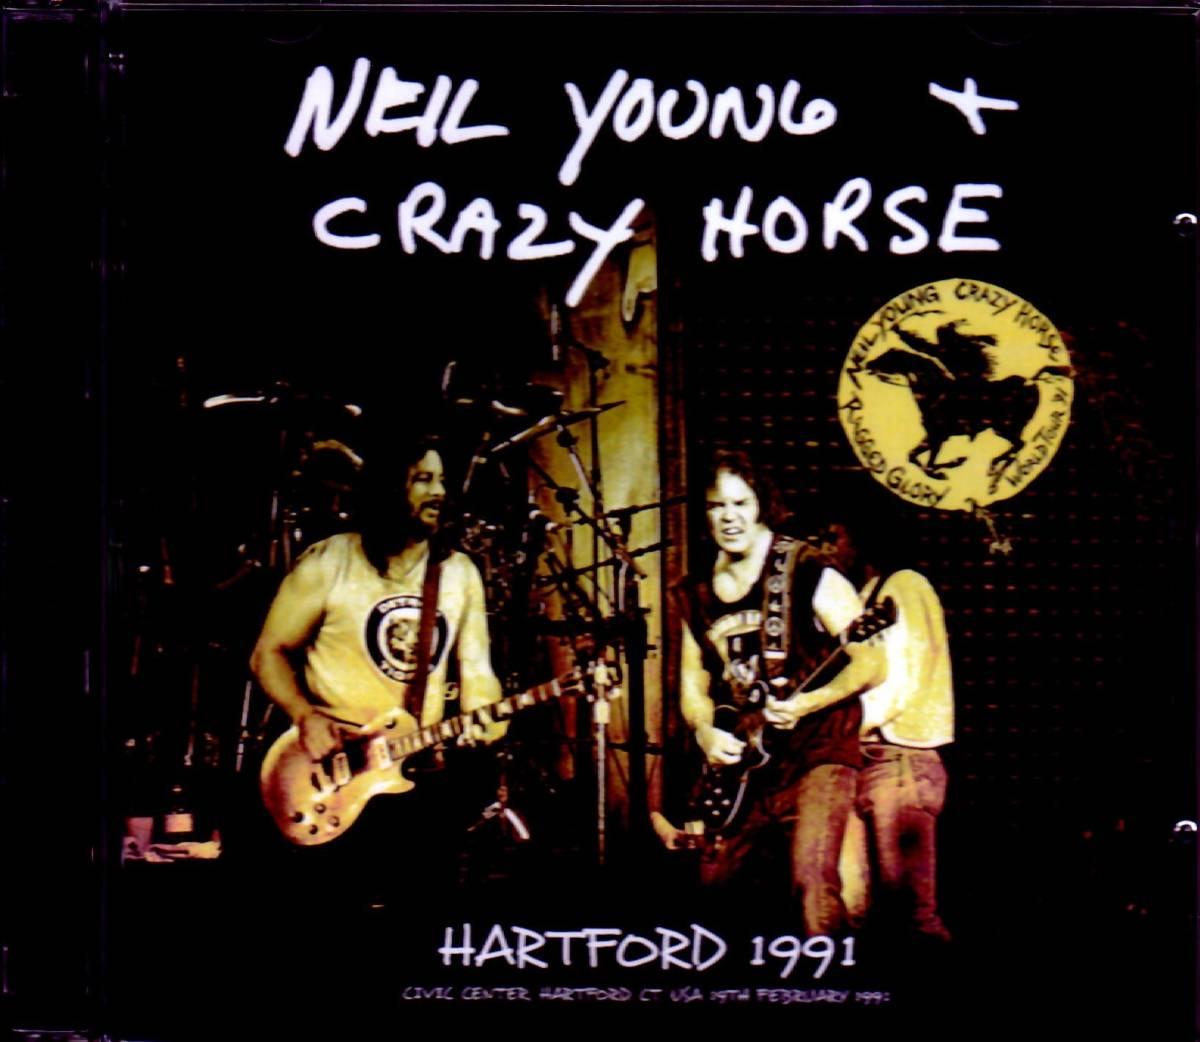 Neil Young & Crazy Horse ニール・ヤング/Hartford 1991